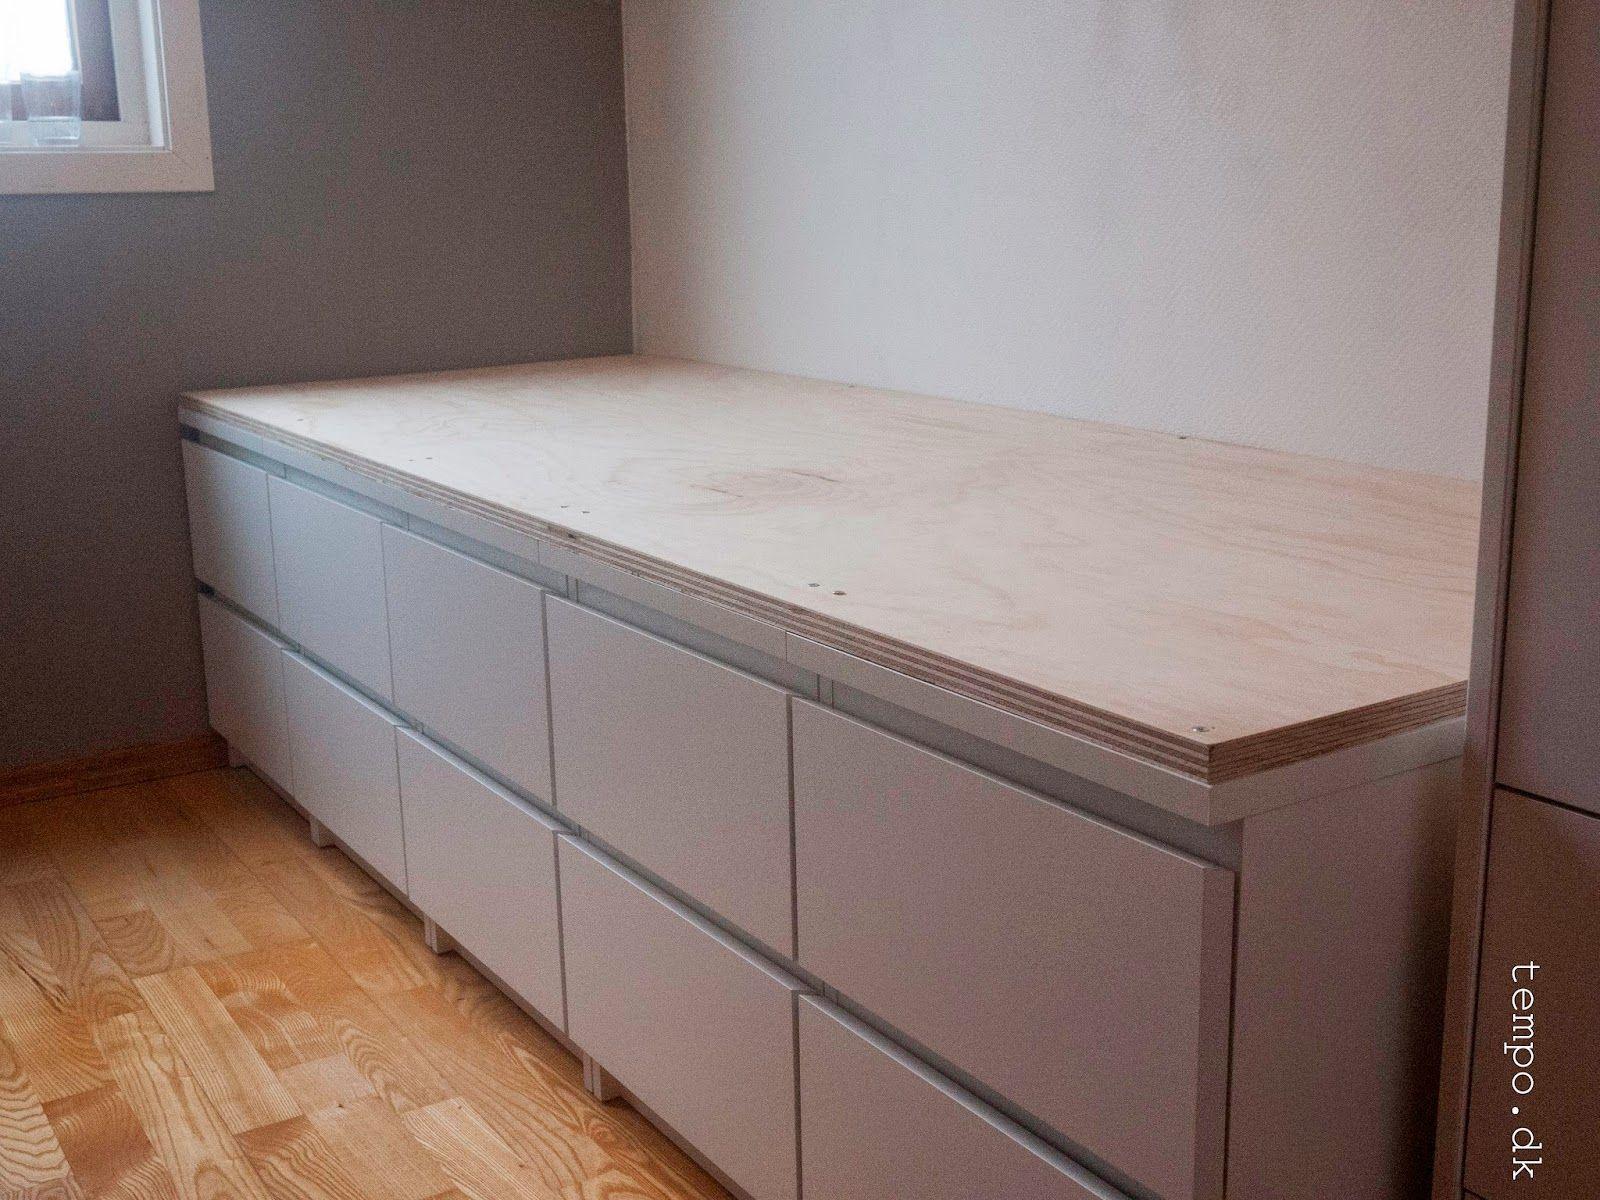 hjemmebygget seng tempo.dk: Hjemmelavet seng | Sovrum | Pinterest | Kids rooms, Room  hjemmebygget seng